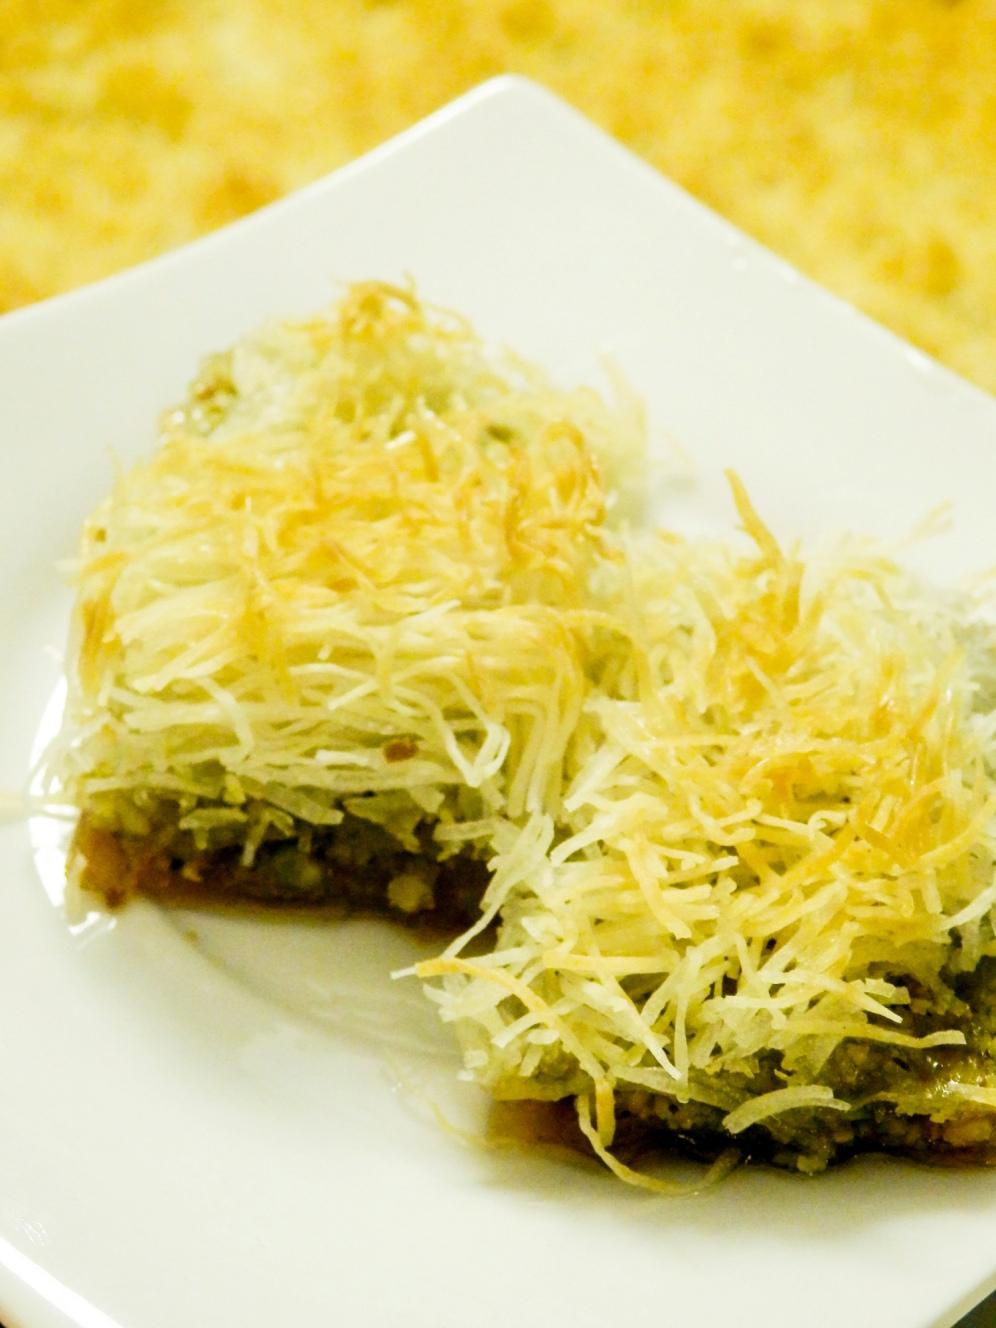 pistacio,baklava,kadaif